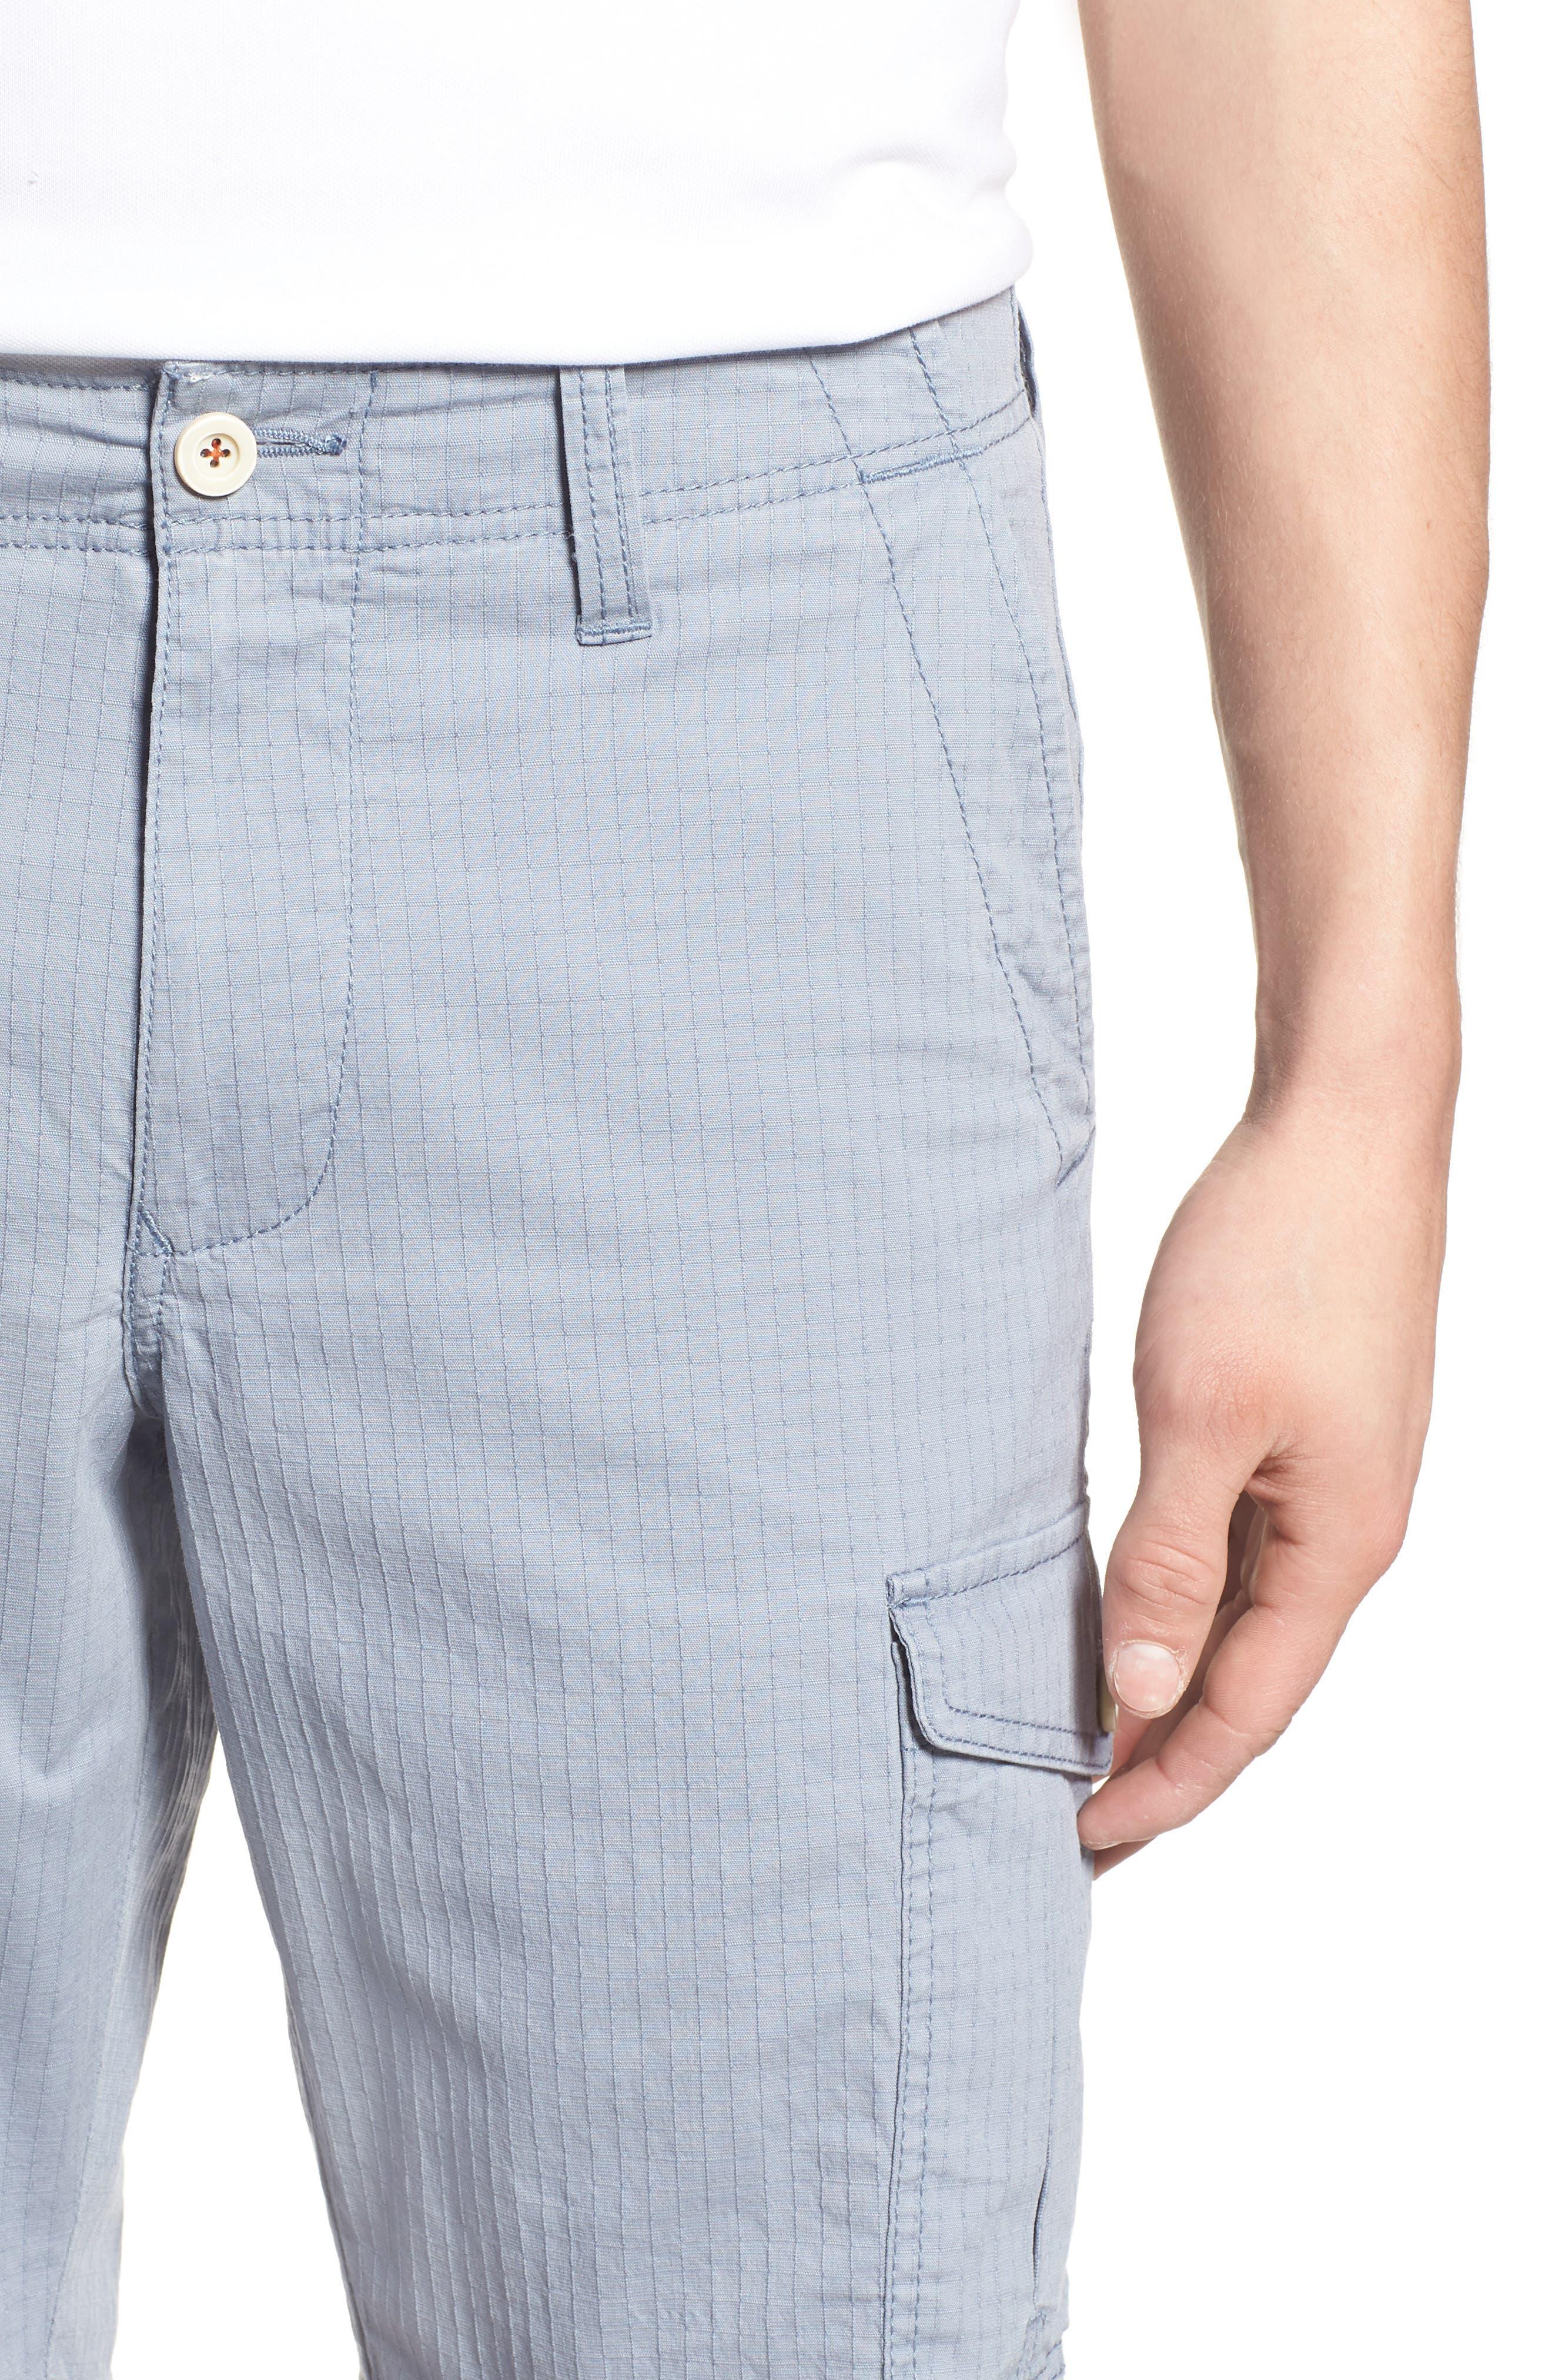 Sandbar Ripstop Cargo Shorts,                             Alternate thumbnail 4, color,                             401